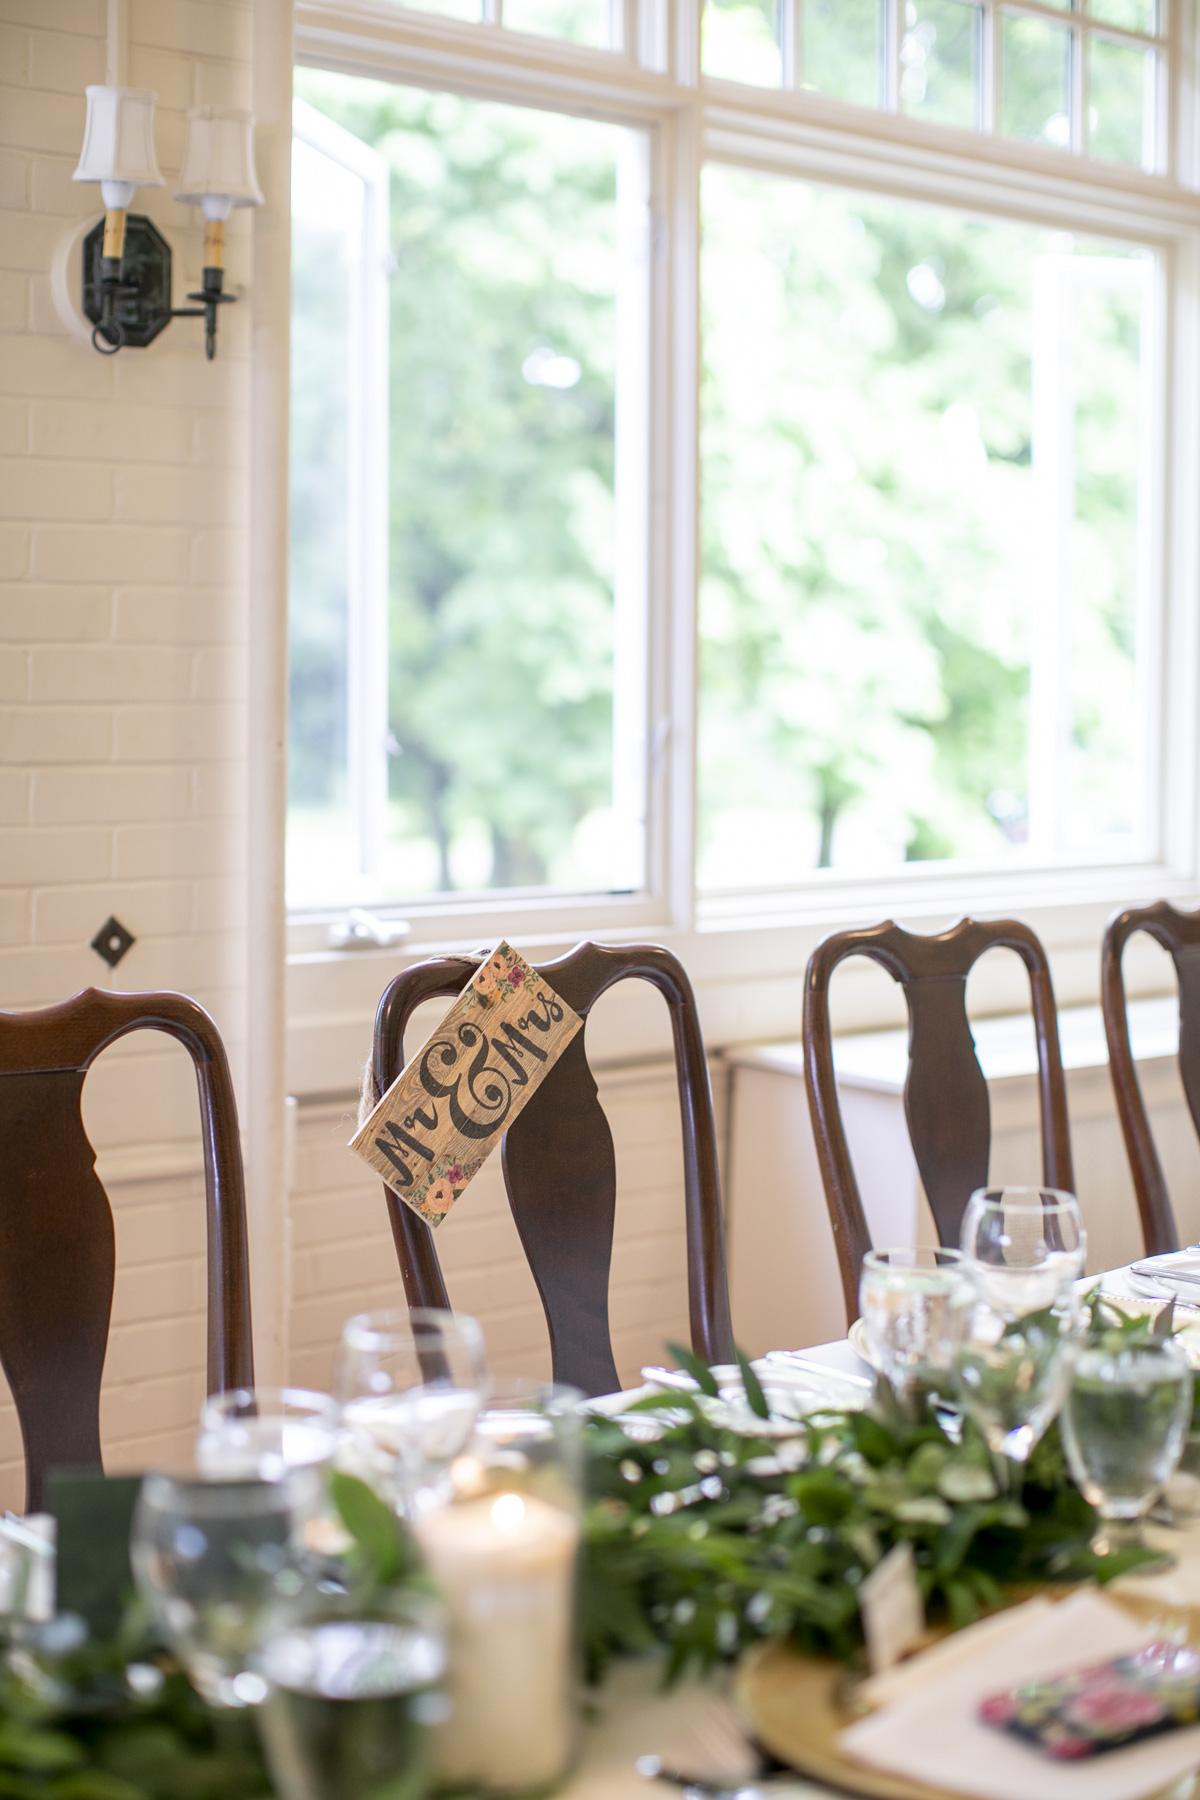 vineyard-bride-philosophy-studios-outdoor-summer-wedding-the-tamahaac-club-niagara-ancaster-toronto-vendor-0101.JPG